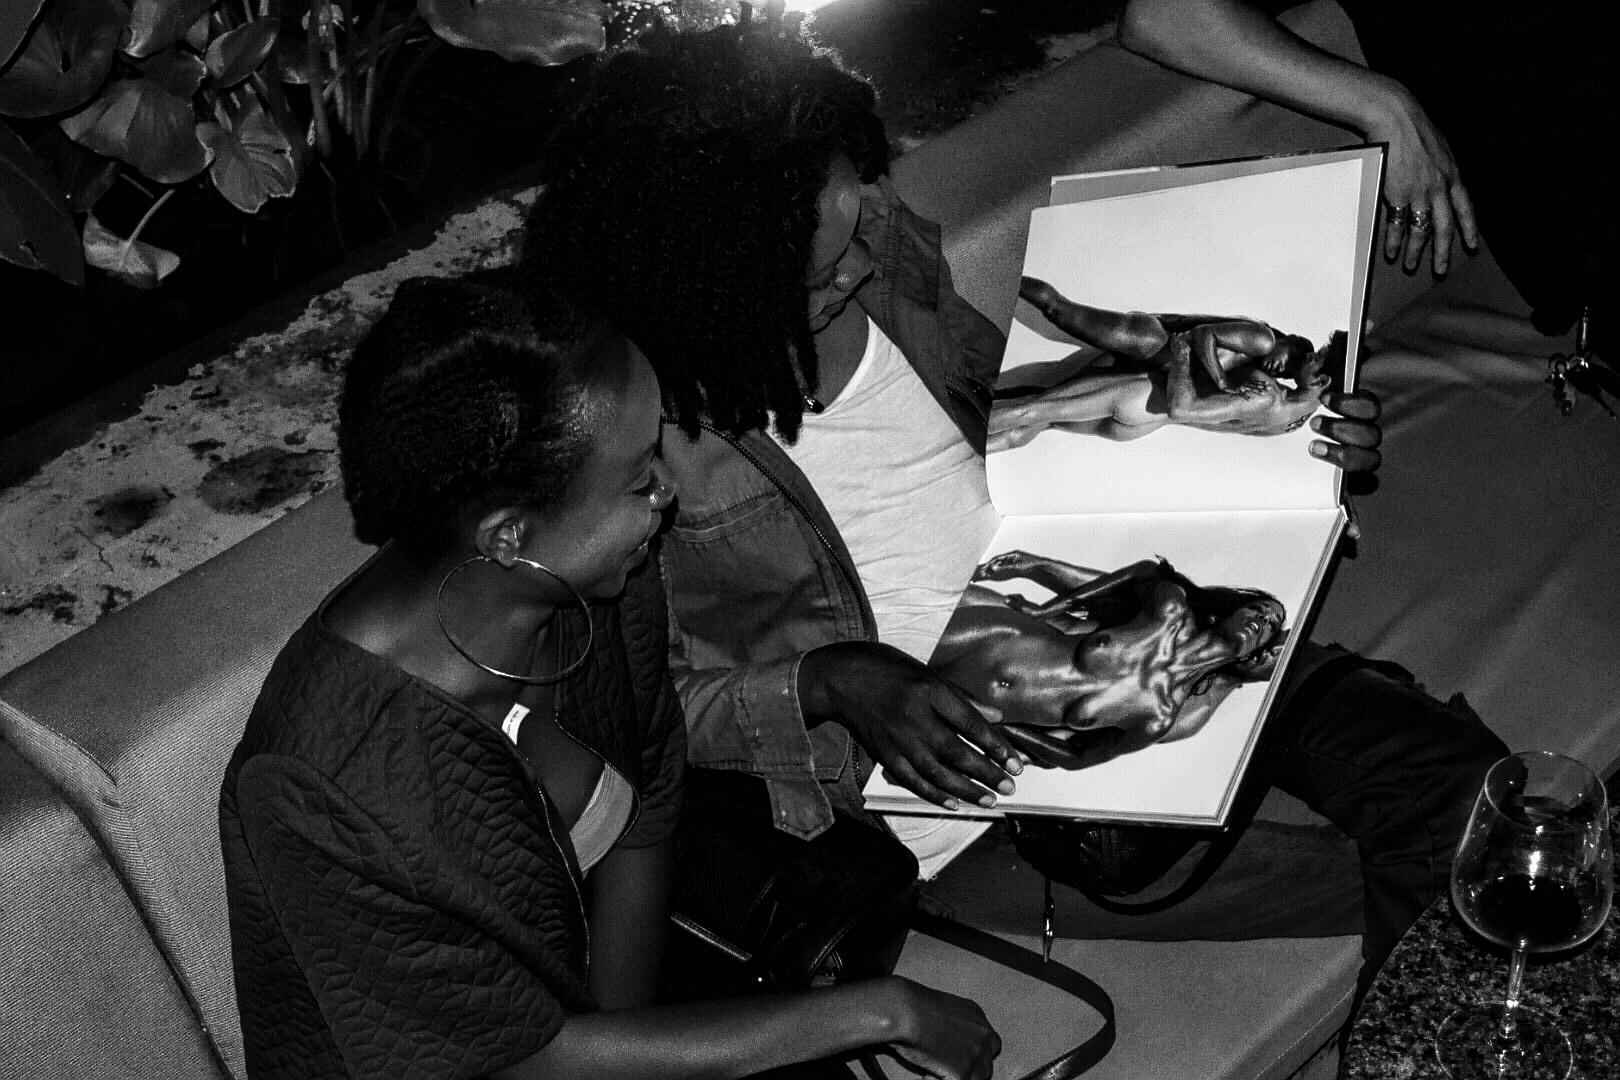 AFROBOUGEE - NOUVEAU NOIR, PHOTOGRAPHY, ART, CREATIVE AFRICA